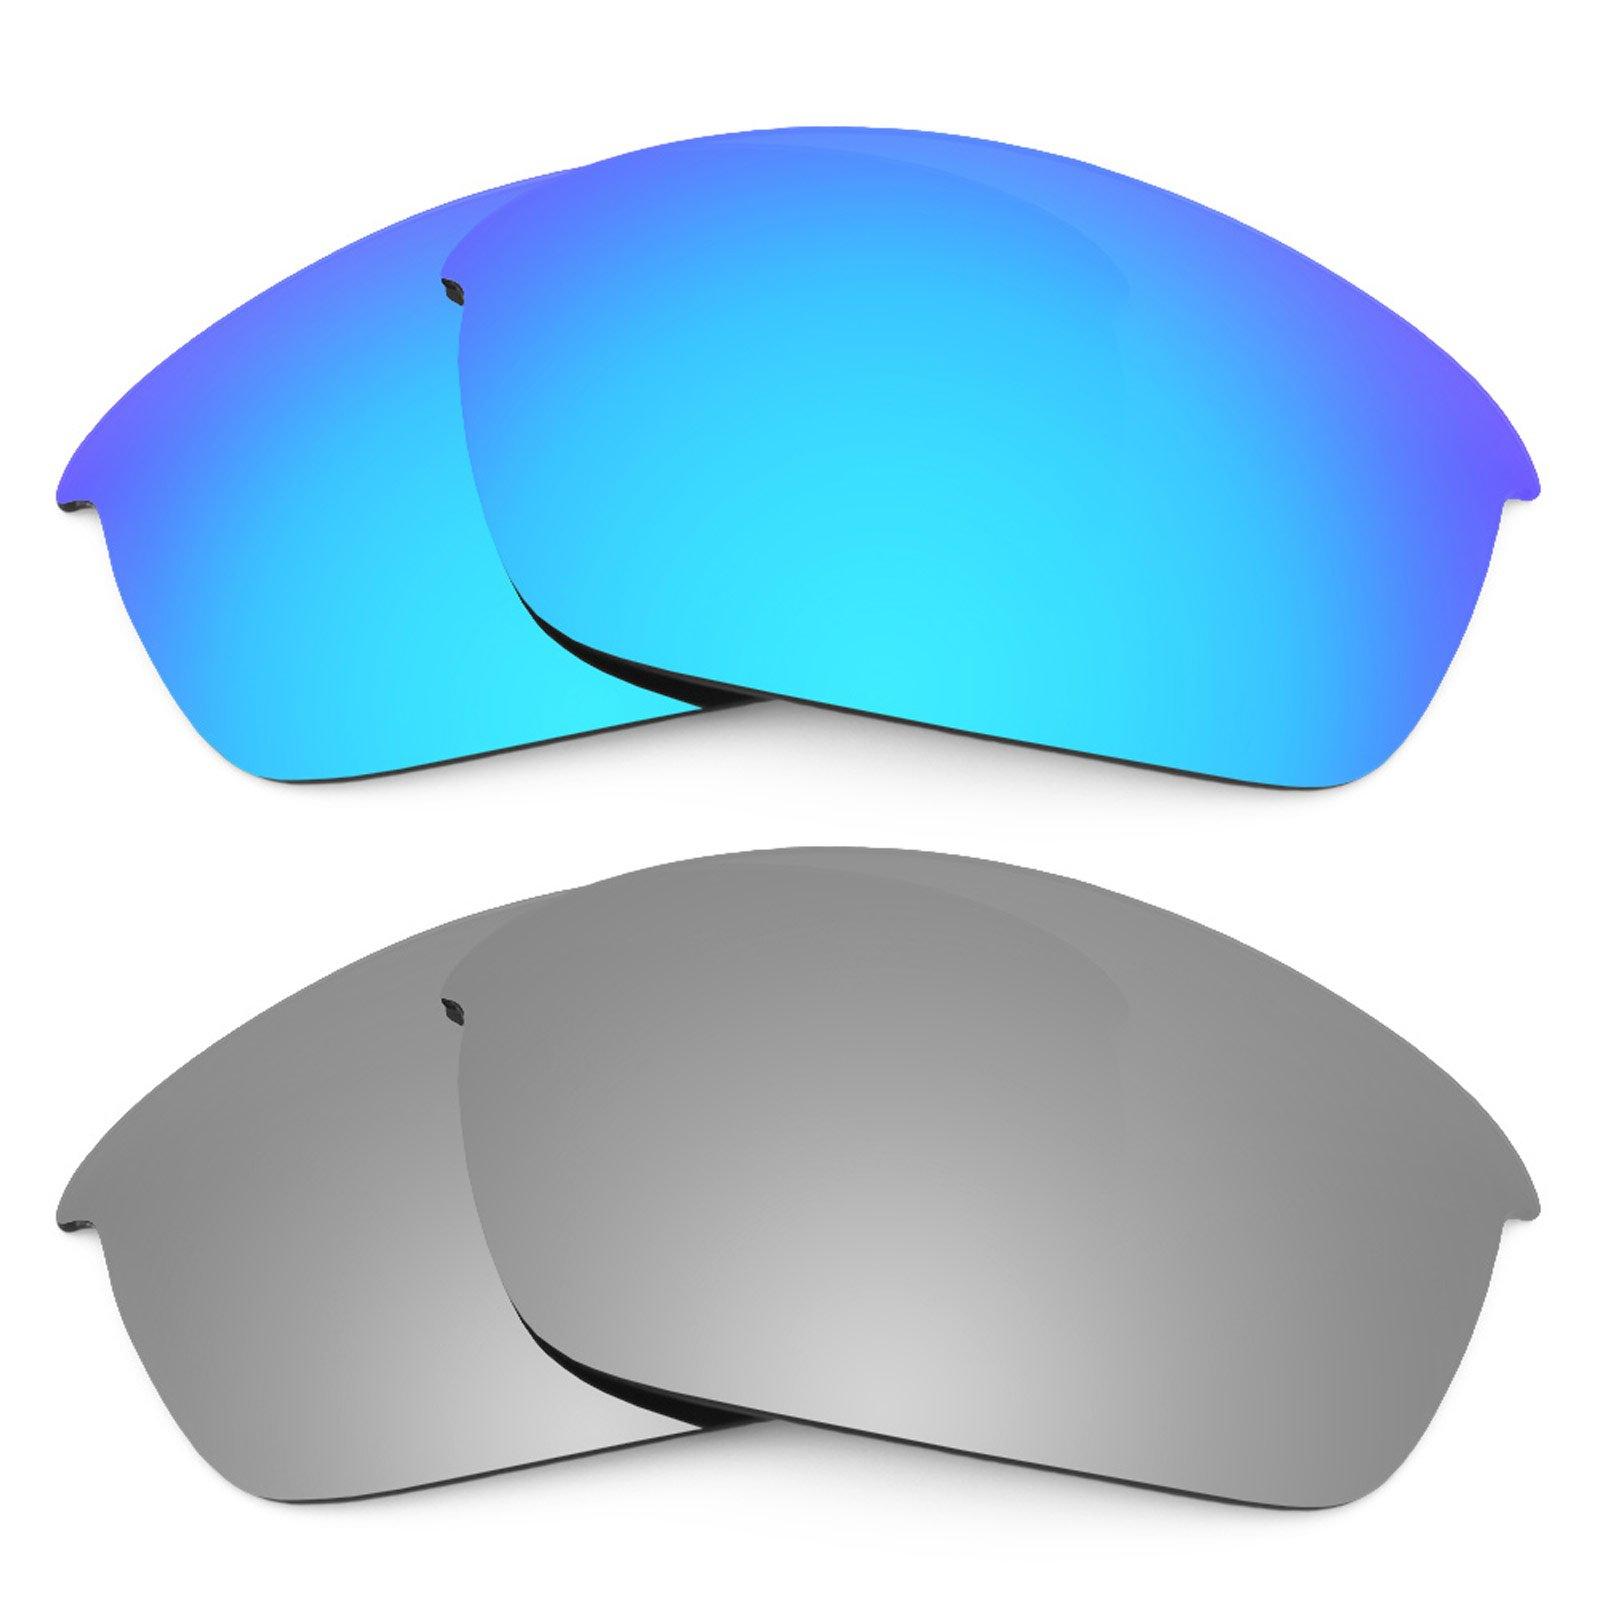 Revant Replacement Lenses for Oakley Flak Jacket 2 Pair Combo Pack K004